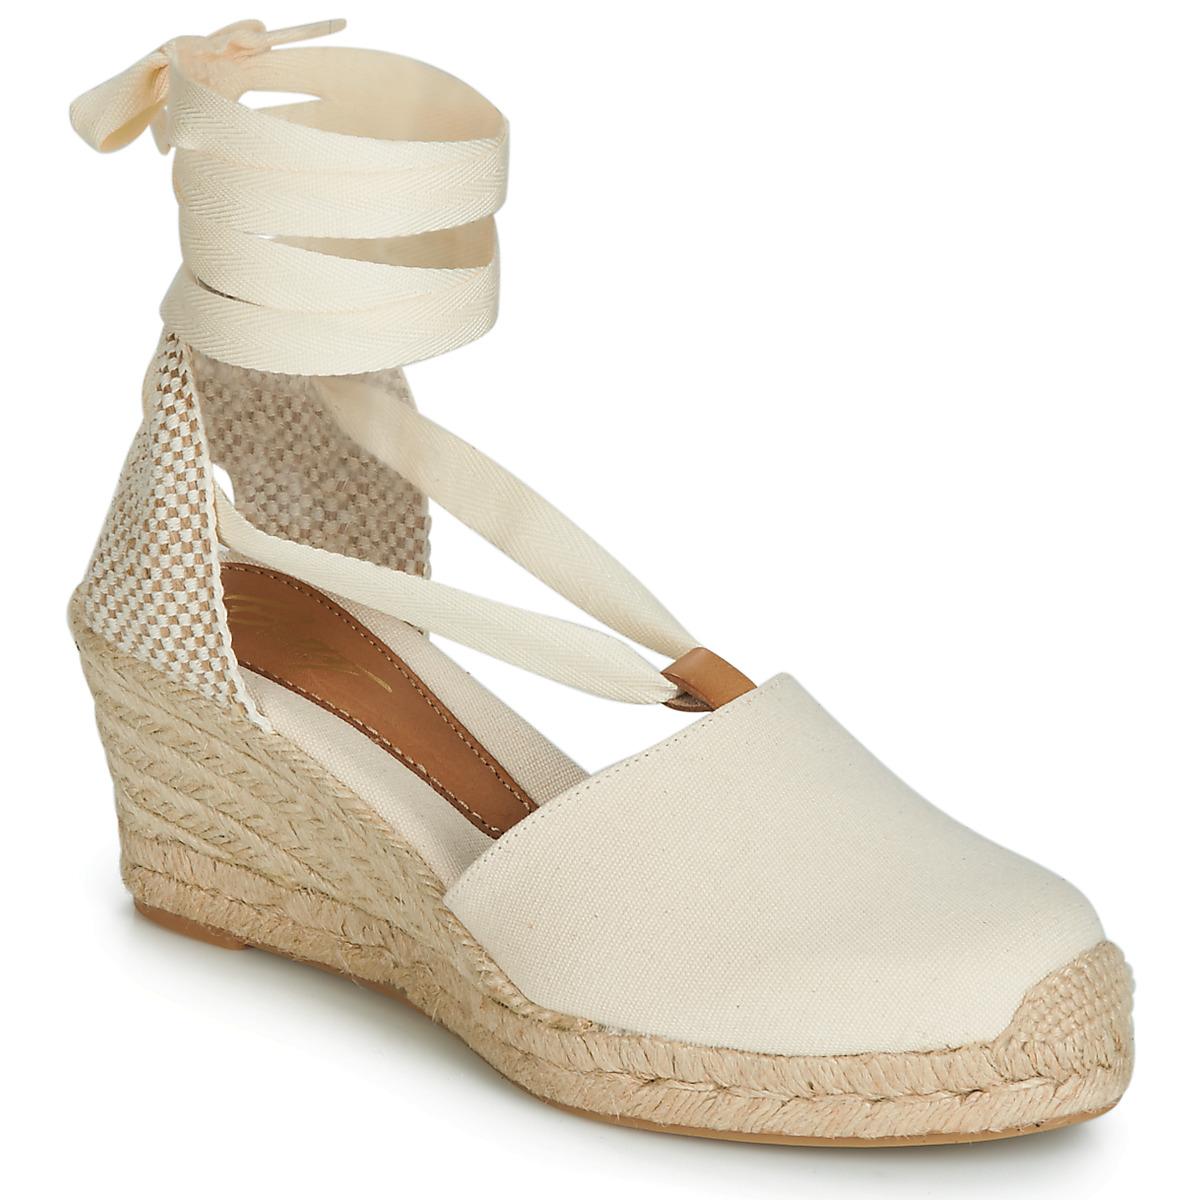 Betty London GRANDA Beige - ! Kostenloser Versand bei Spartoode ! - - Schuhe Sandalen / Sandaletten Damen 39,99 € cbd52e